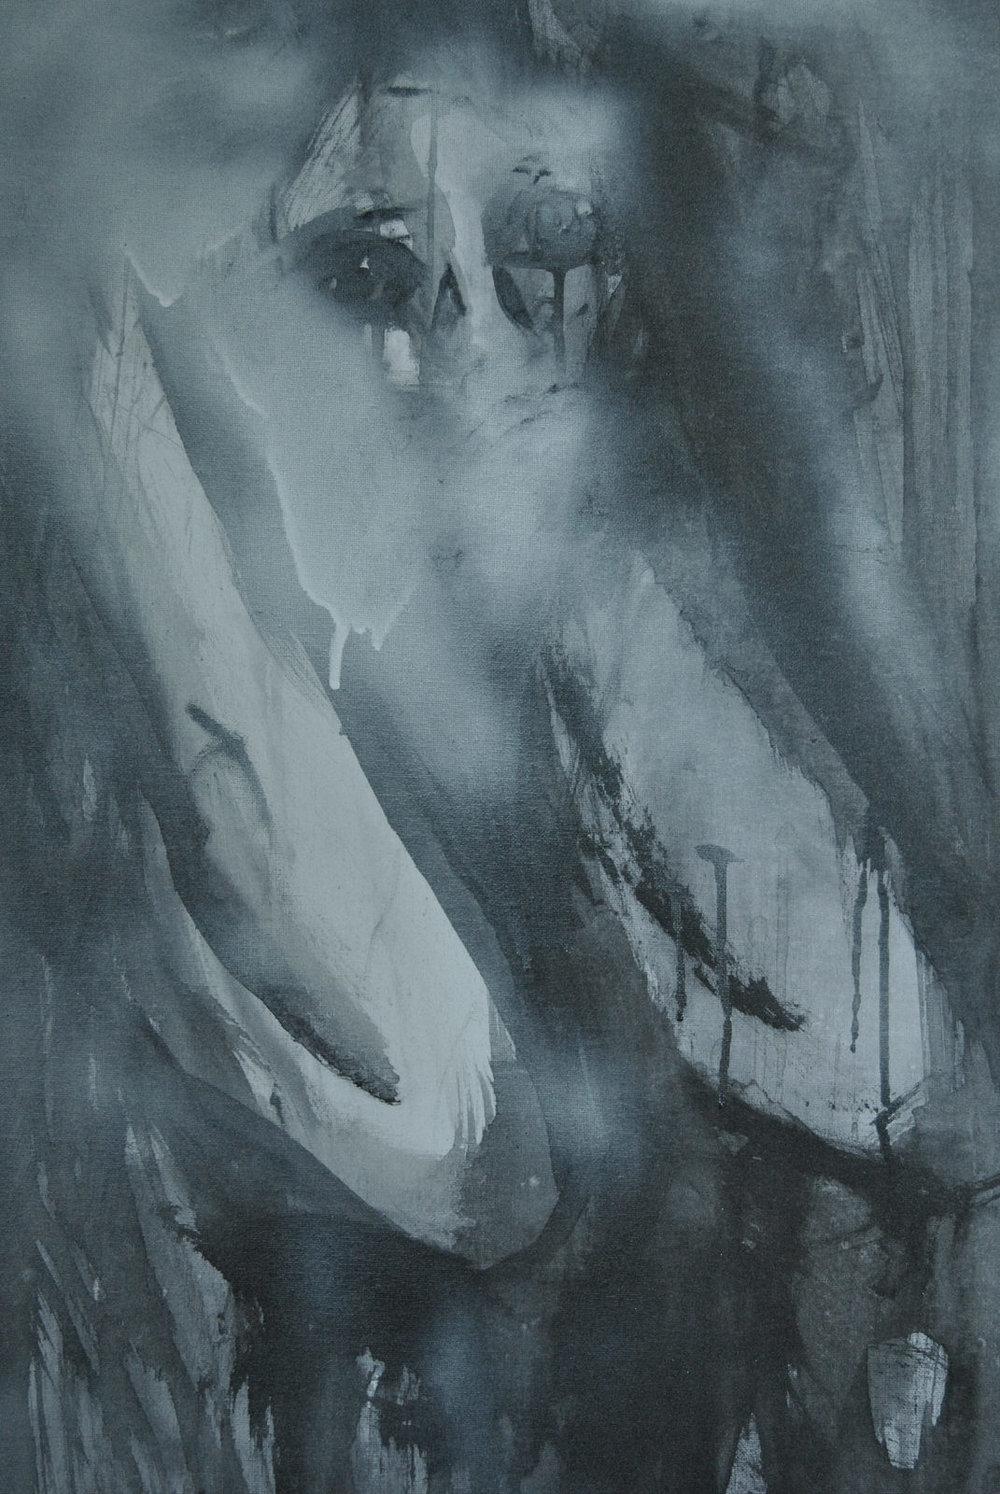 Acrylic and Spray paint on Canvas, 594 x 841 mm,  17-11-15